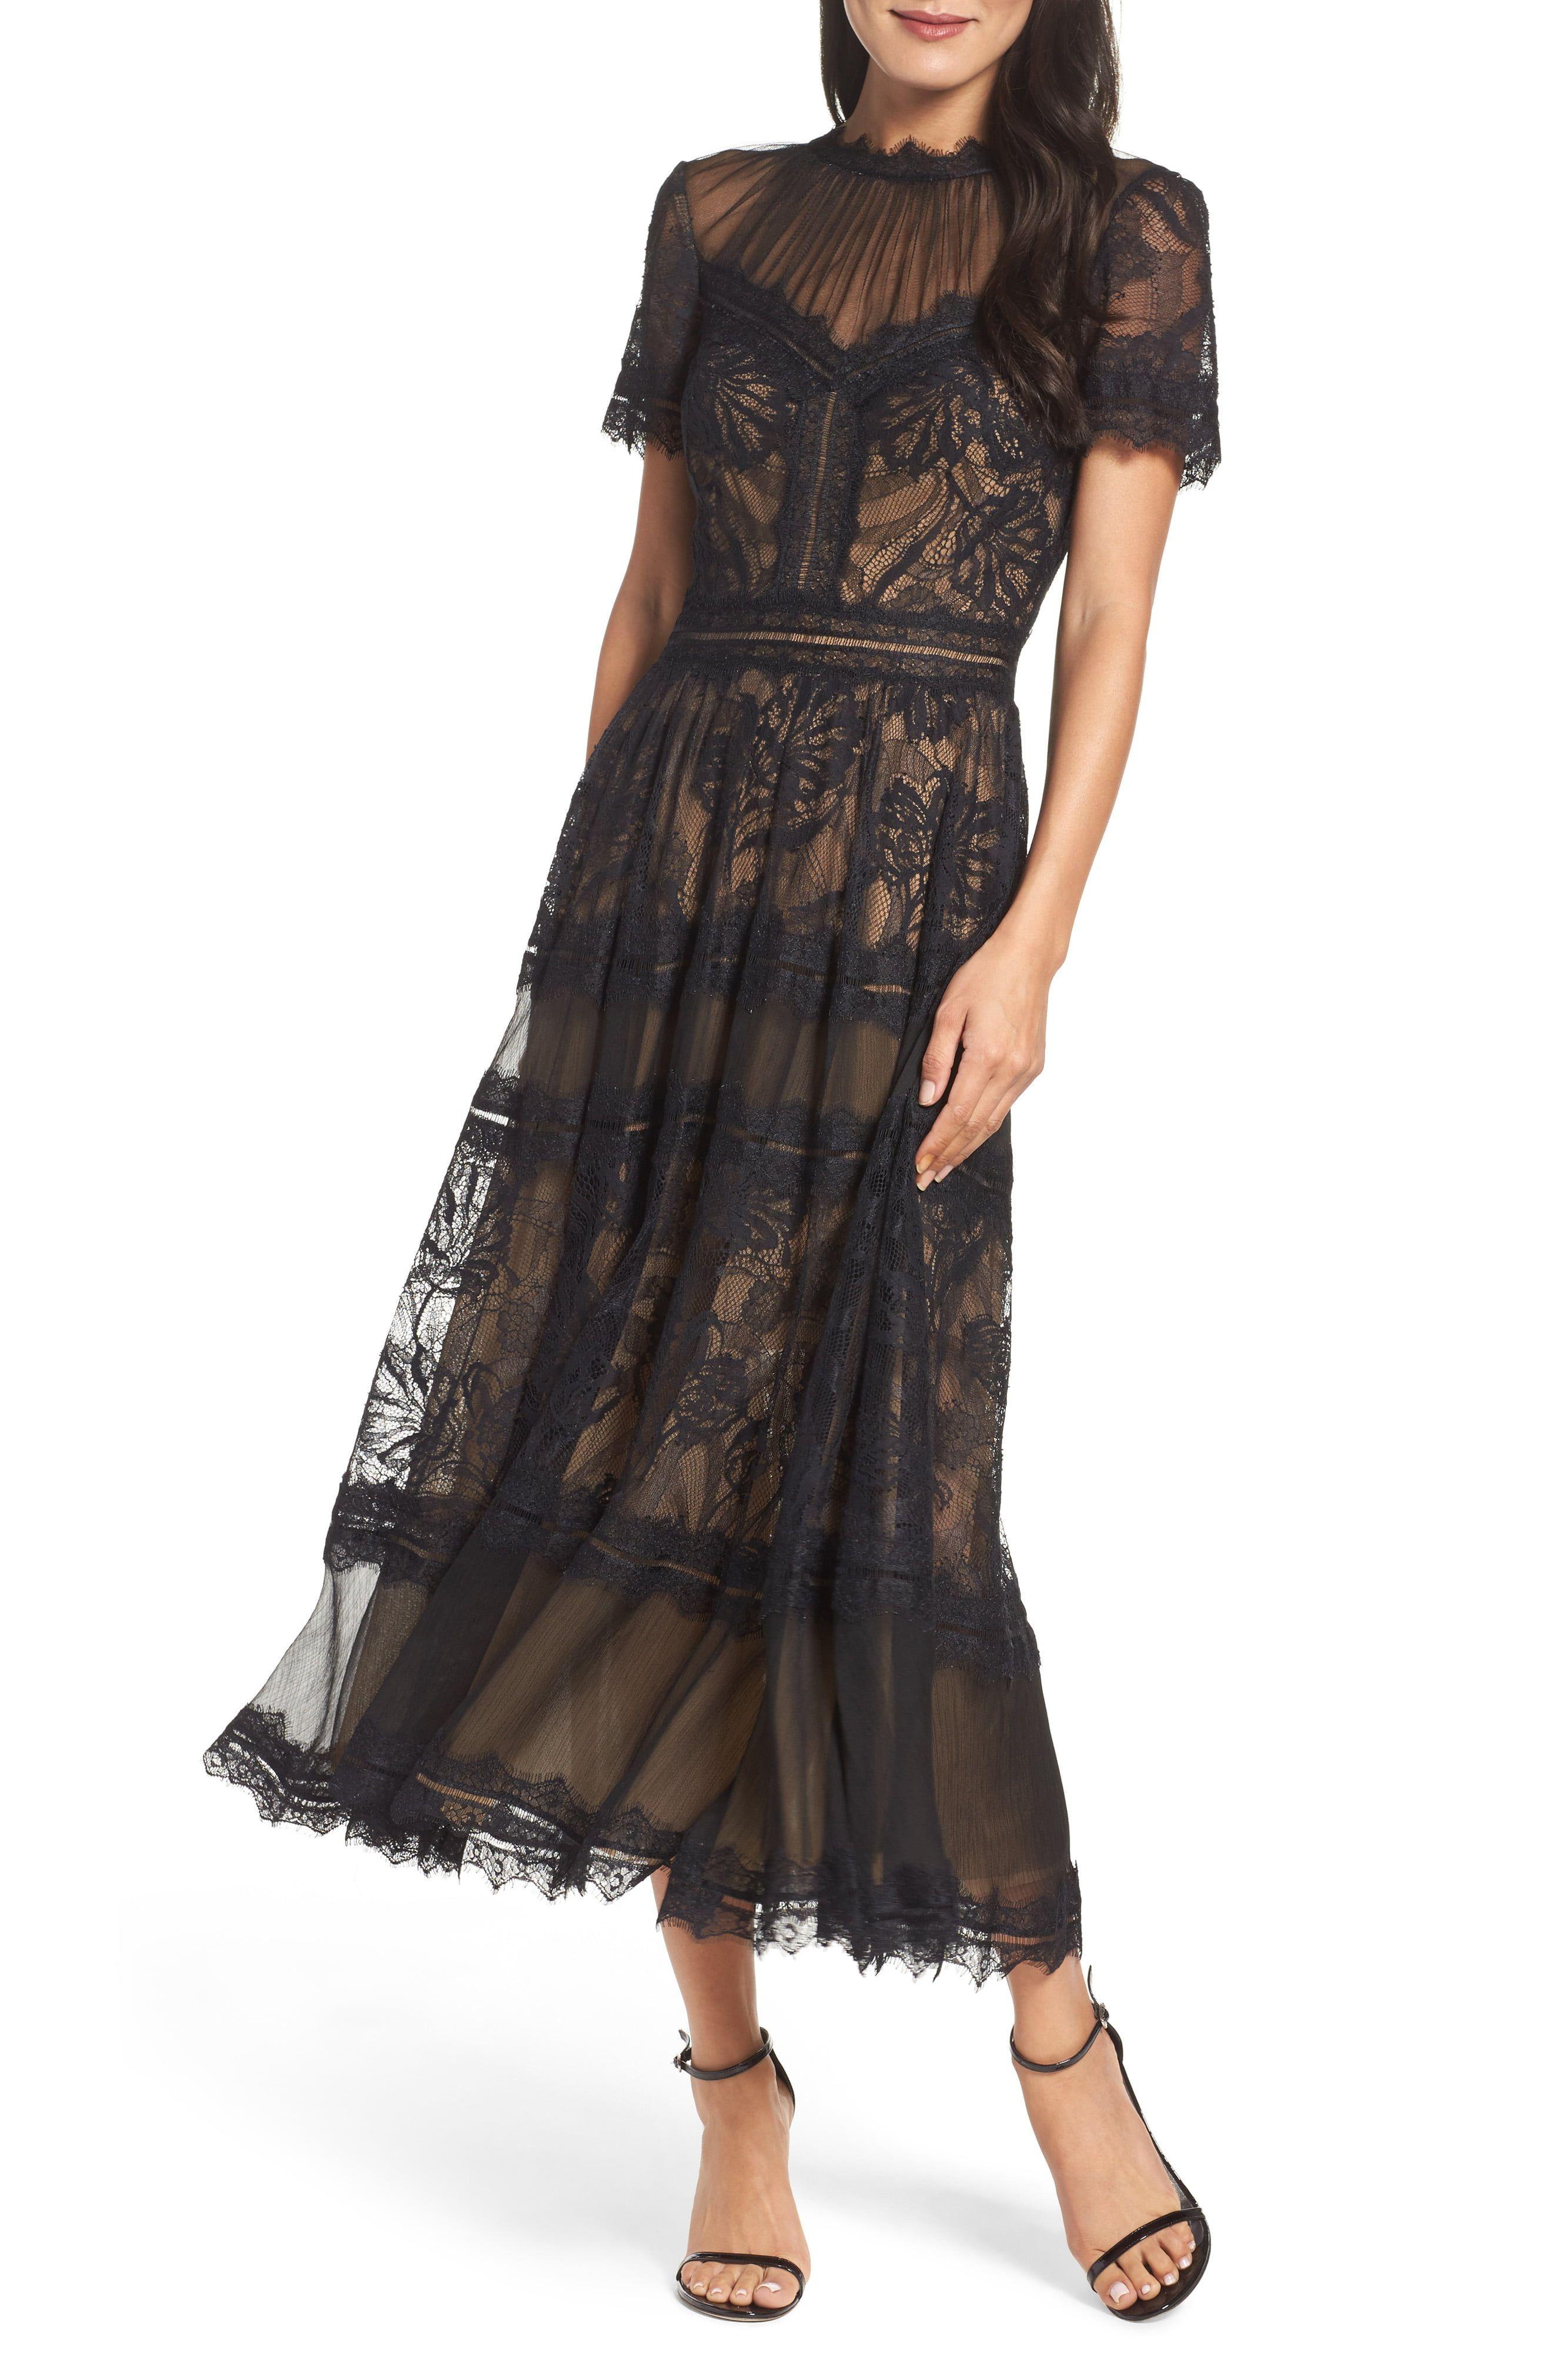 Tadashi Shoji Lace Midi Dress Nordstrom Lace Tea Length Dress Lace Midi Dress Tea Length Dresses [ 4048 x 2640 Pixel ]